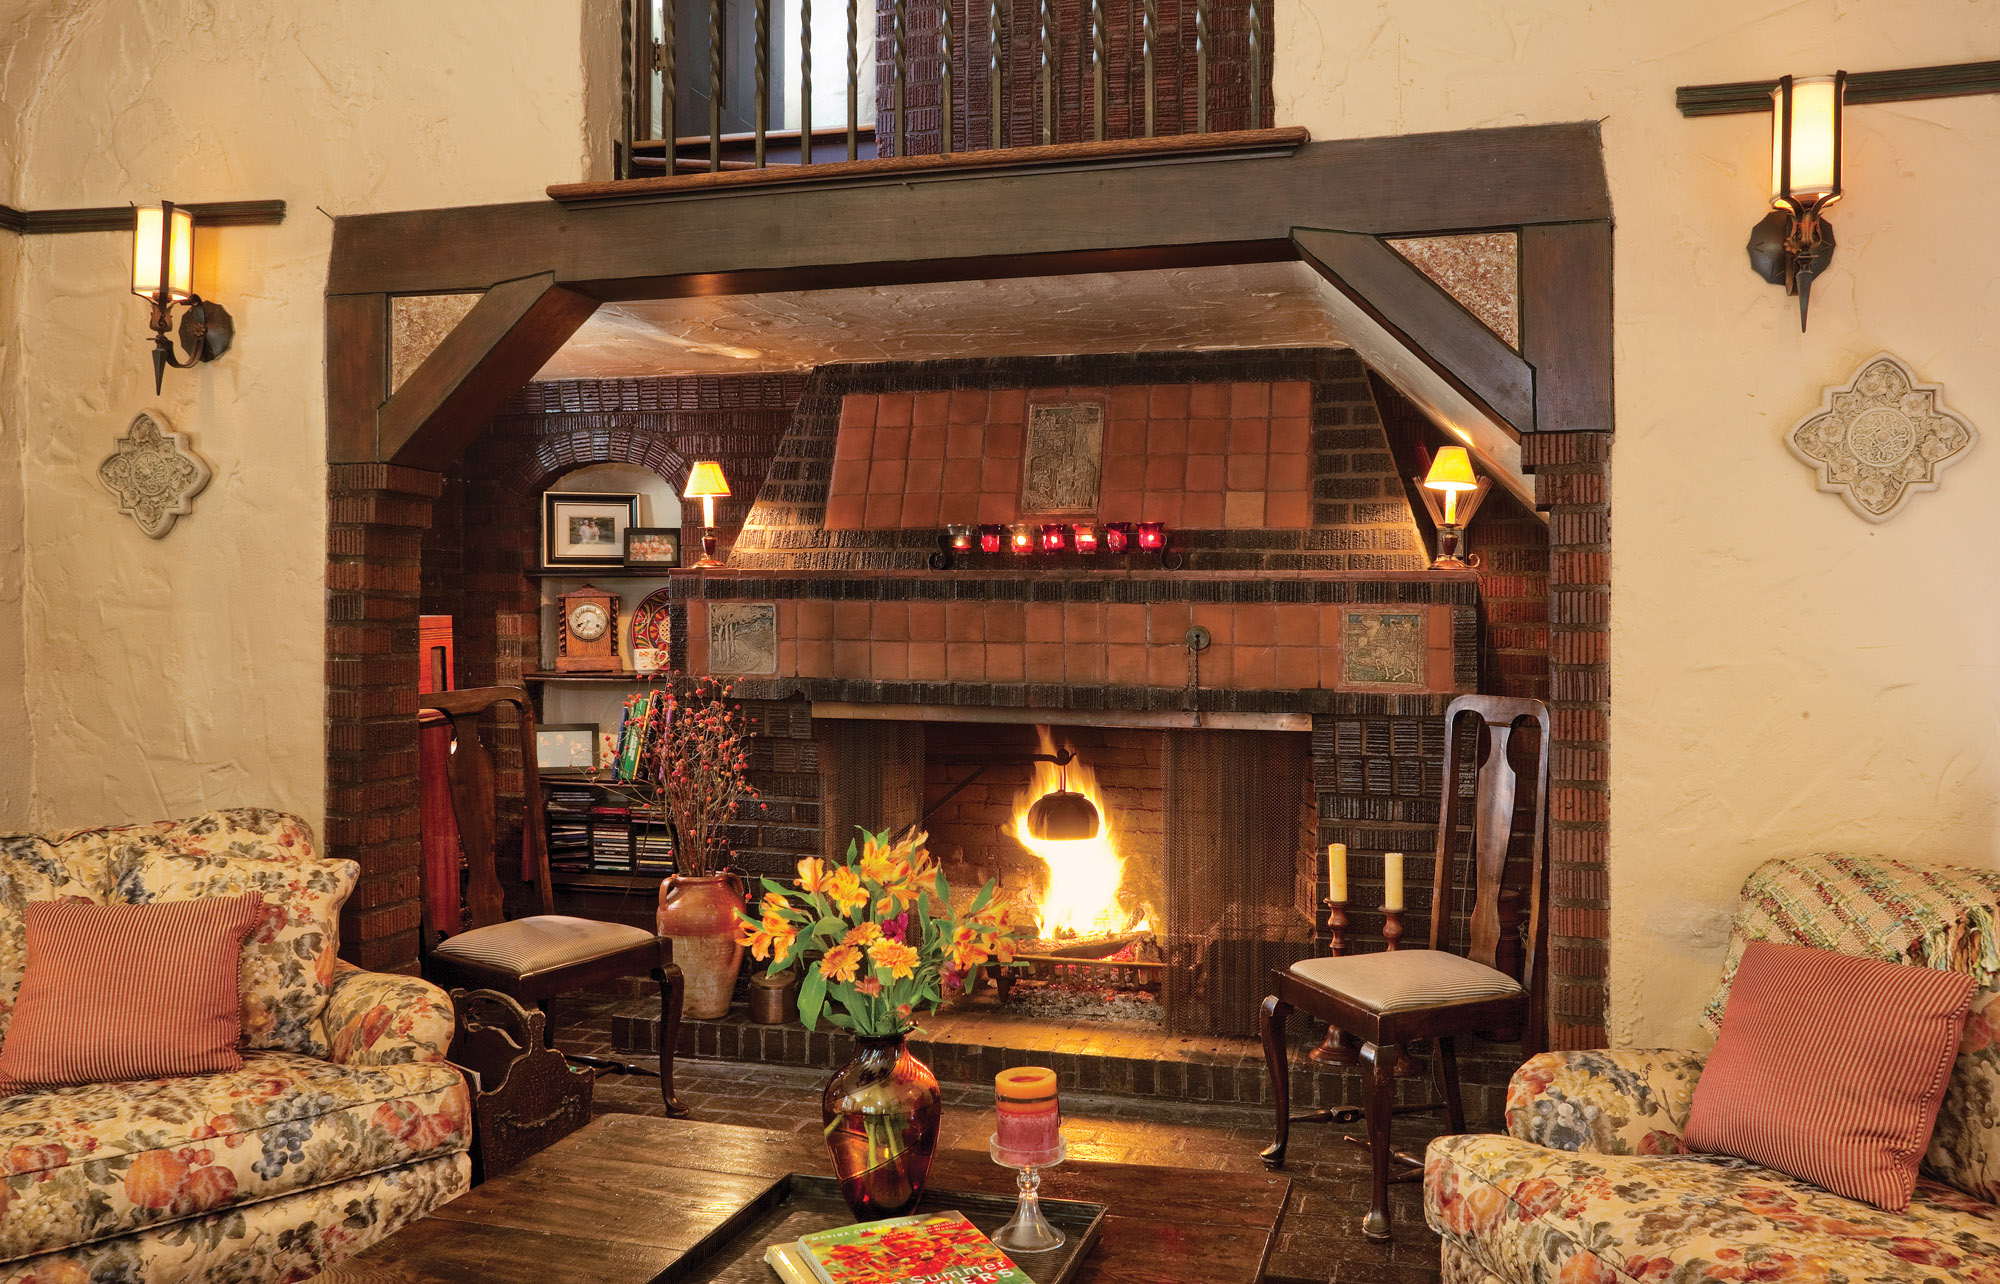 14_LR_Fireplace_IMG_0036_bjk